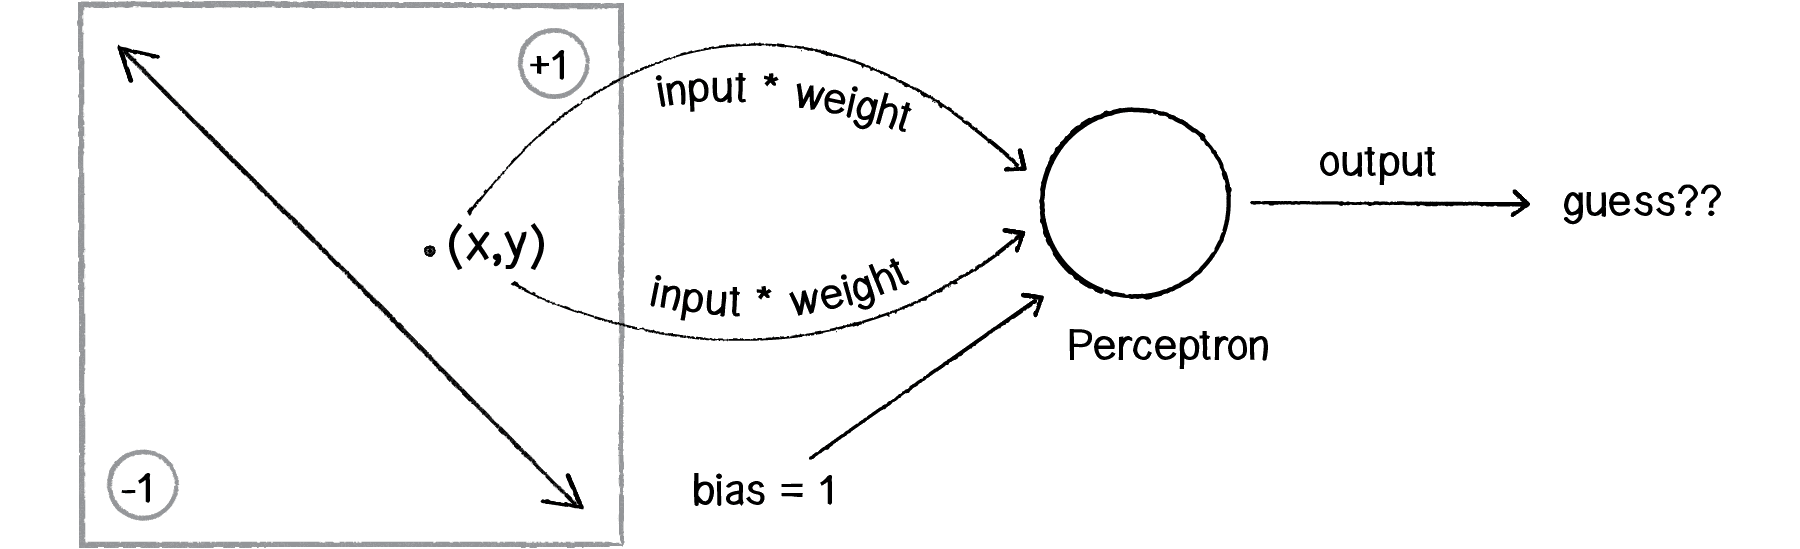 perceptron-2